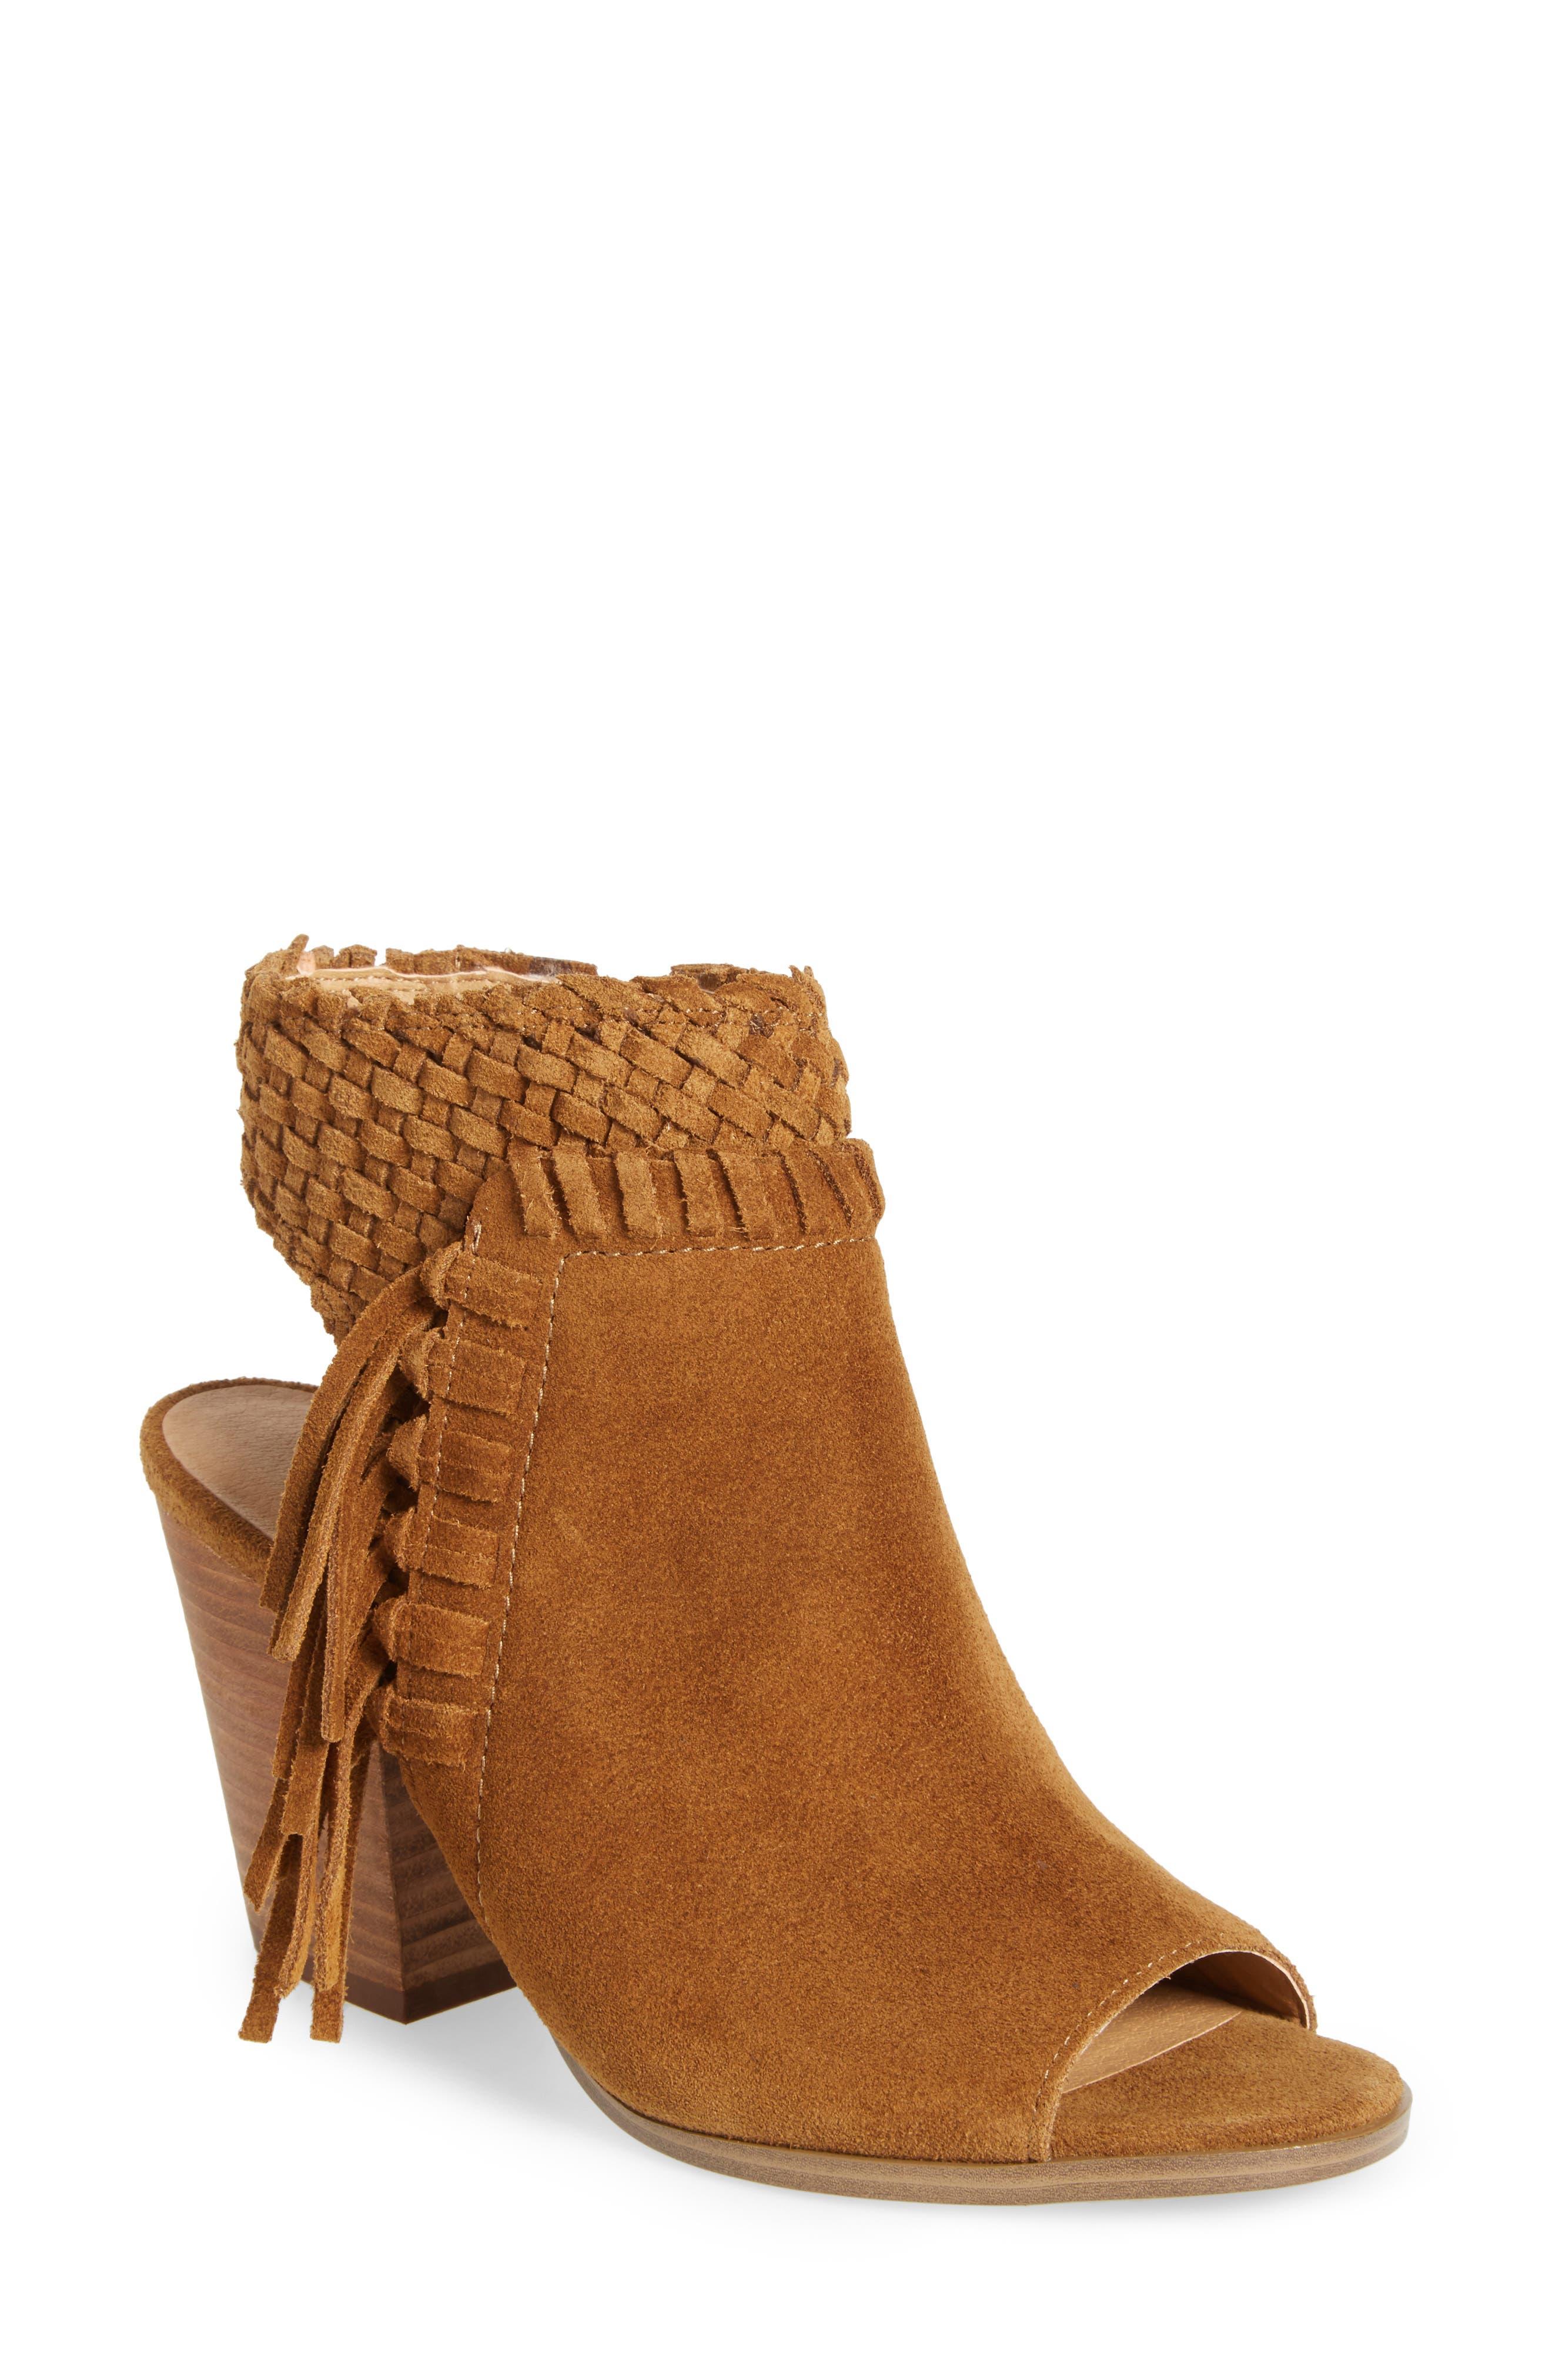 Main Image - Lucky Brand Ointlee Fringe Bootie Sandal (Women)